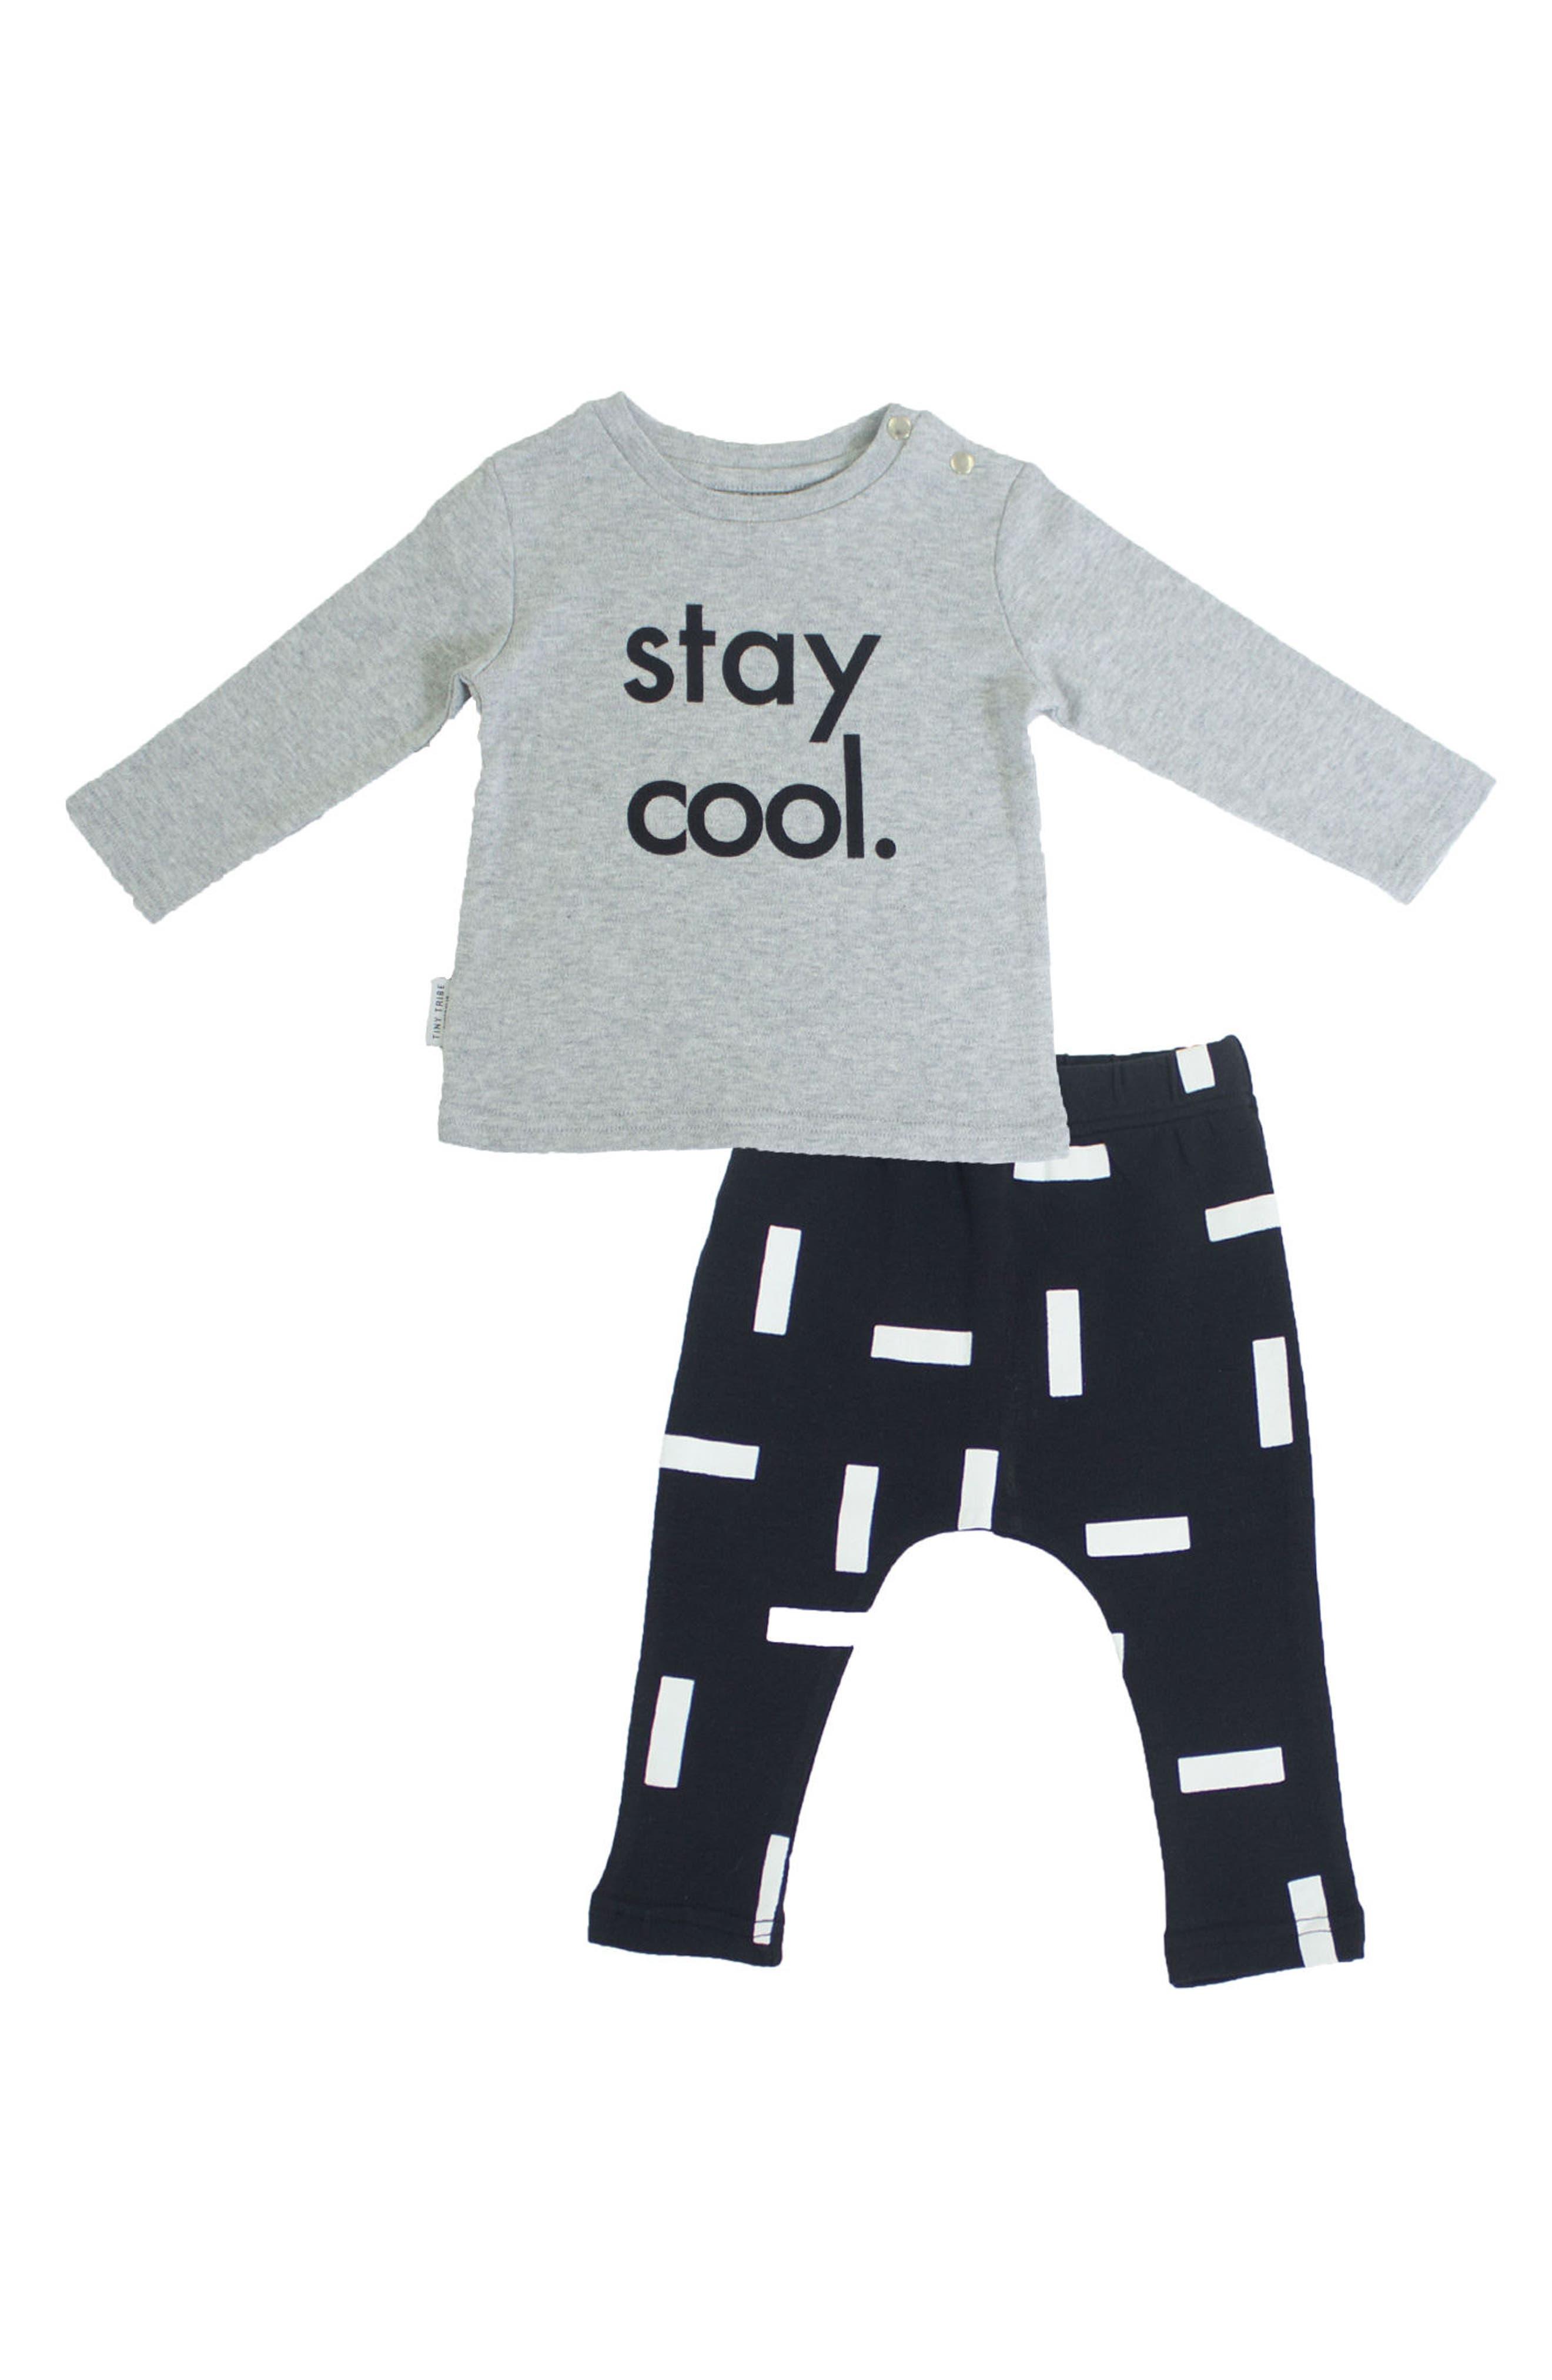 Main Image - Tiny Tribe Stay Cool T-Shirt & Leggings Set (Baby & Toddler)